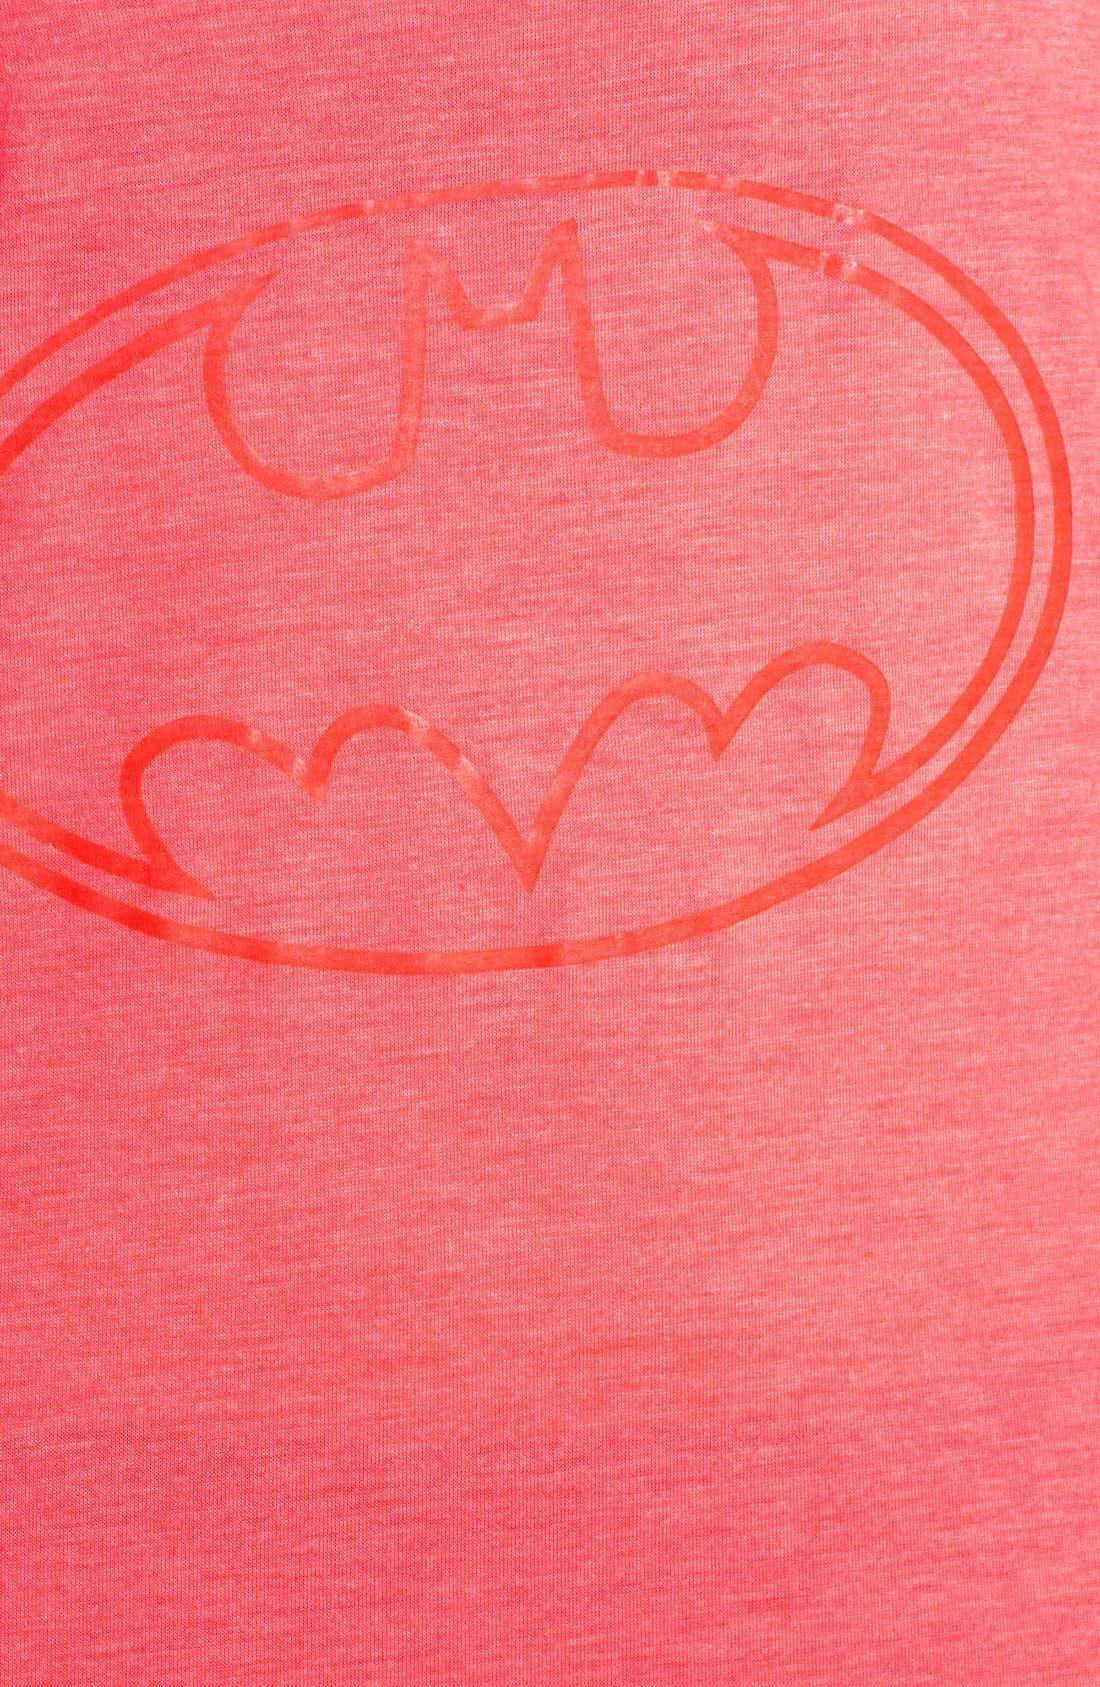 Alternate Image 4  - Under Armour 'Alter Ego - Batgirl' Racerback Tank